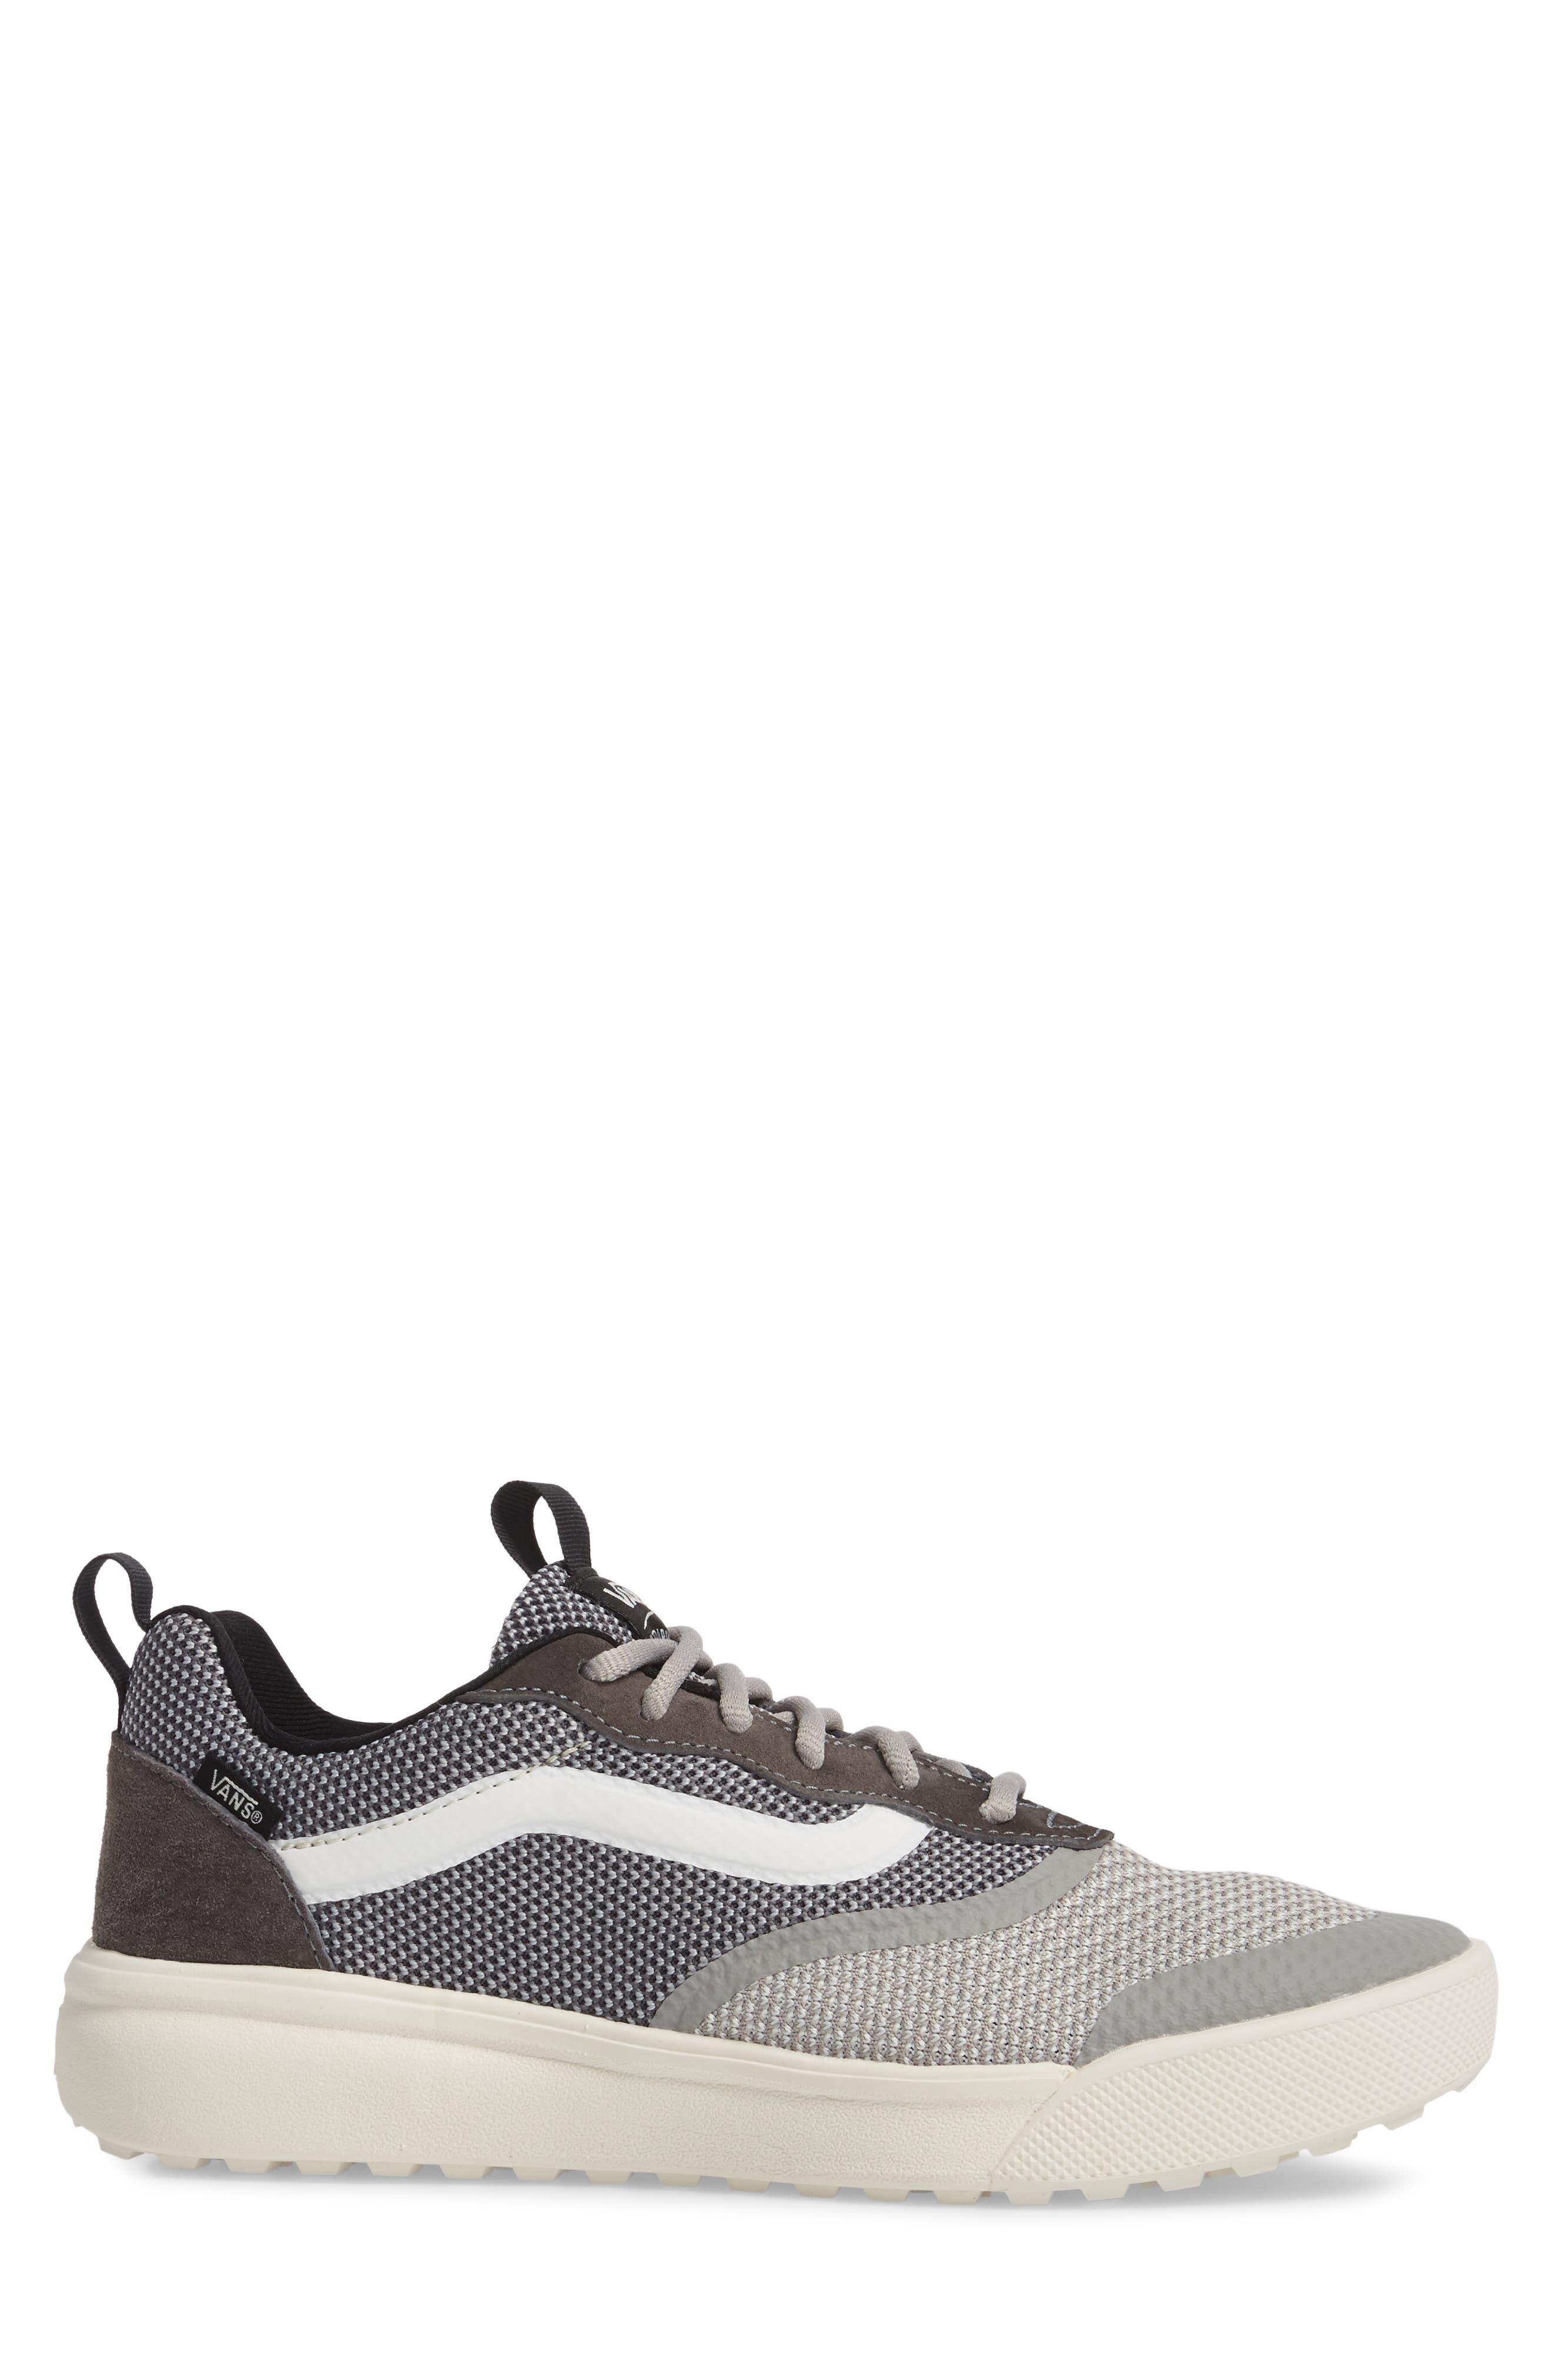 UltraRange DX Low Top Sneaker,                             Alternate thumbnail 3, color,                             021